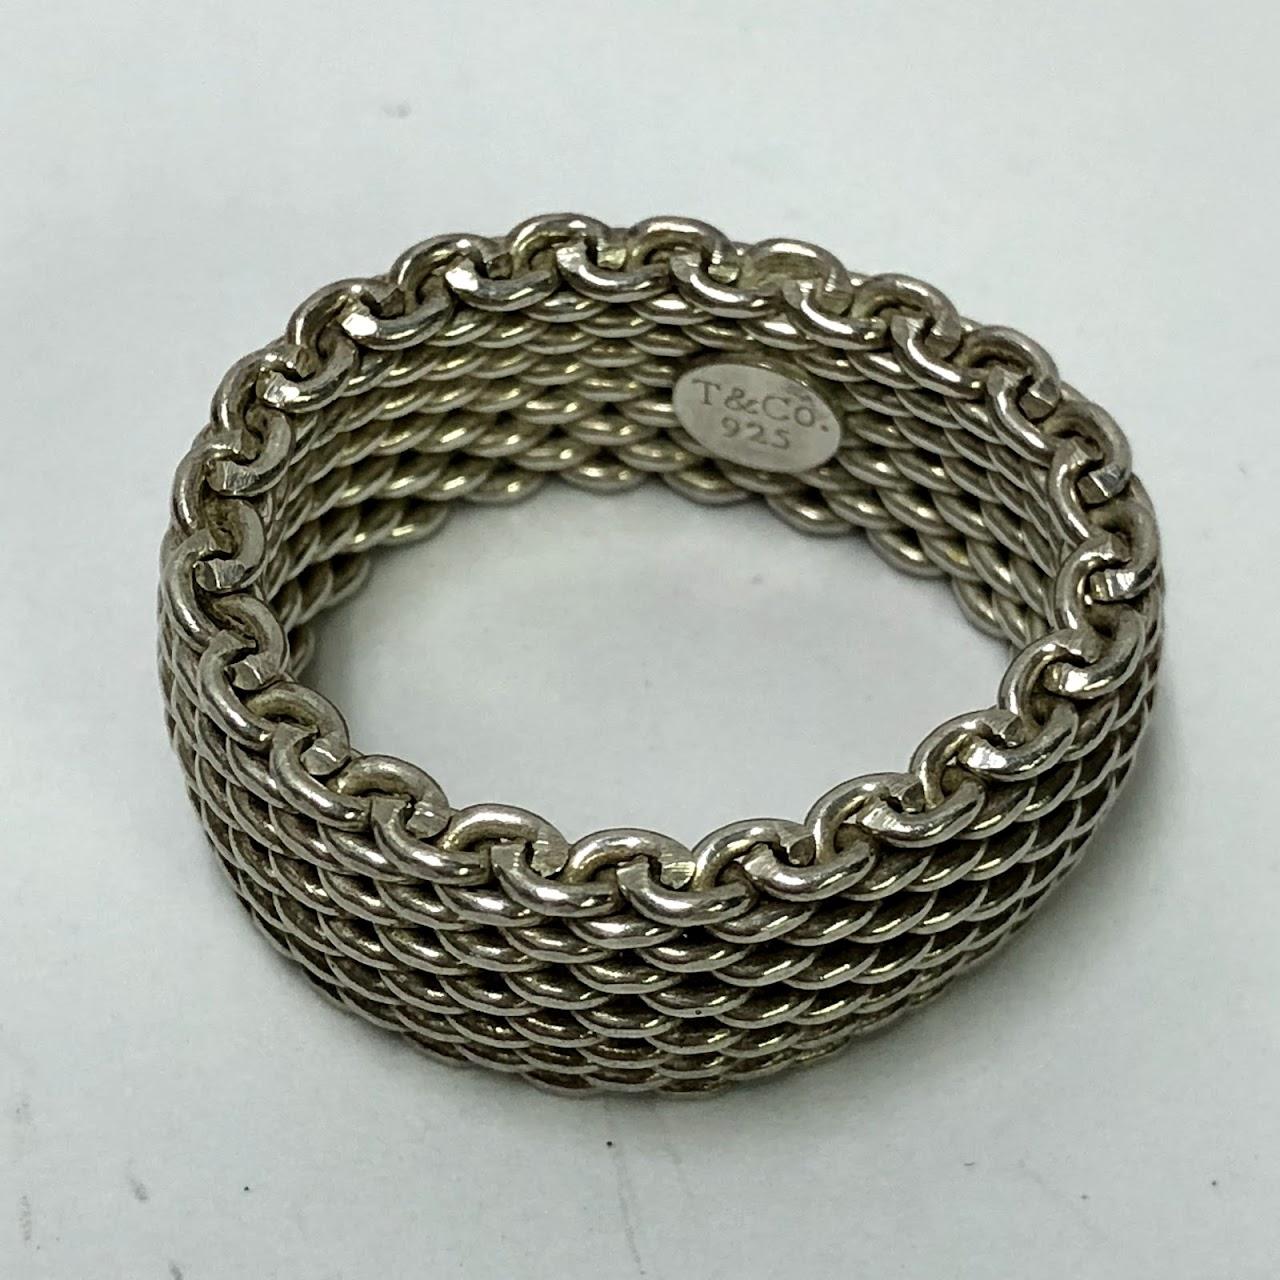 b93b7dd728625 Tiffany & Co. Sterling Silver Somerset Ring #2   Shophousingworks